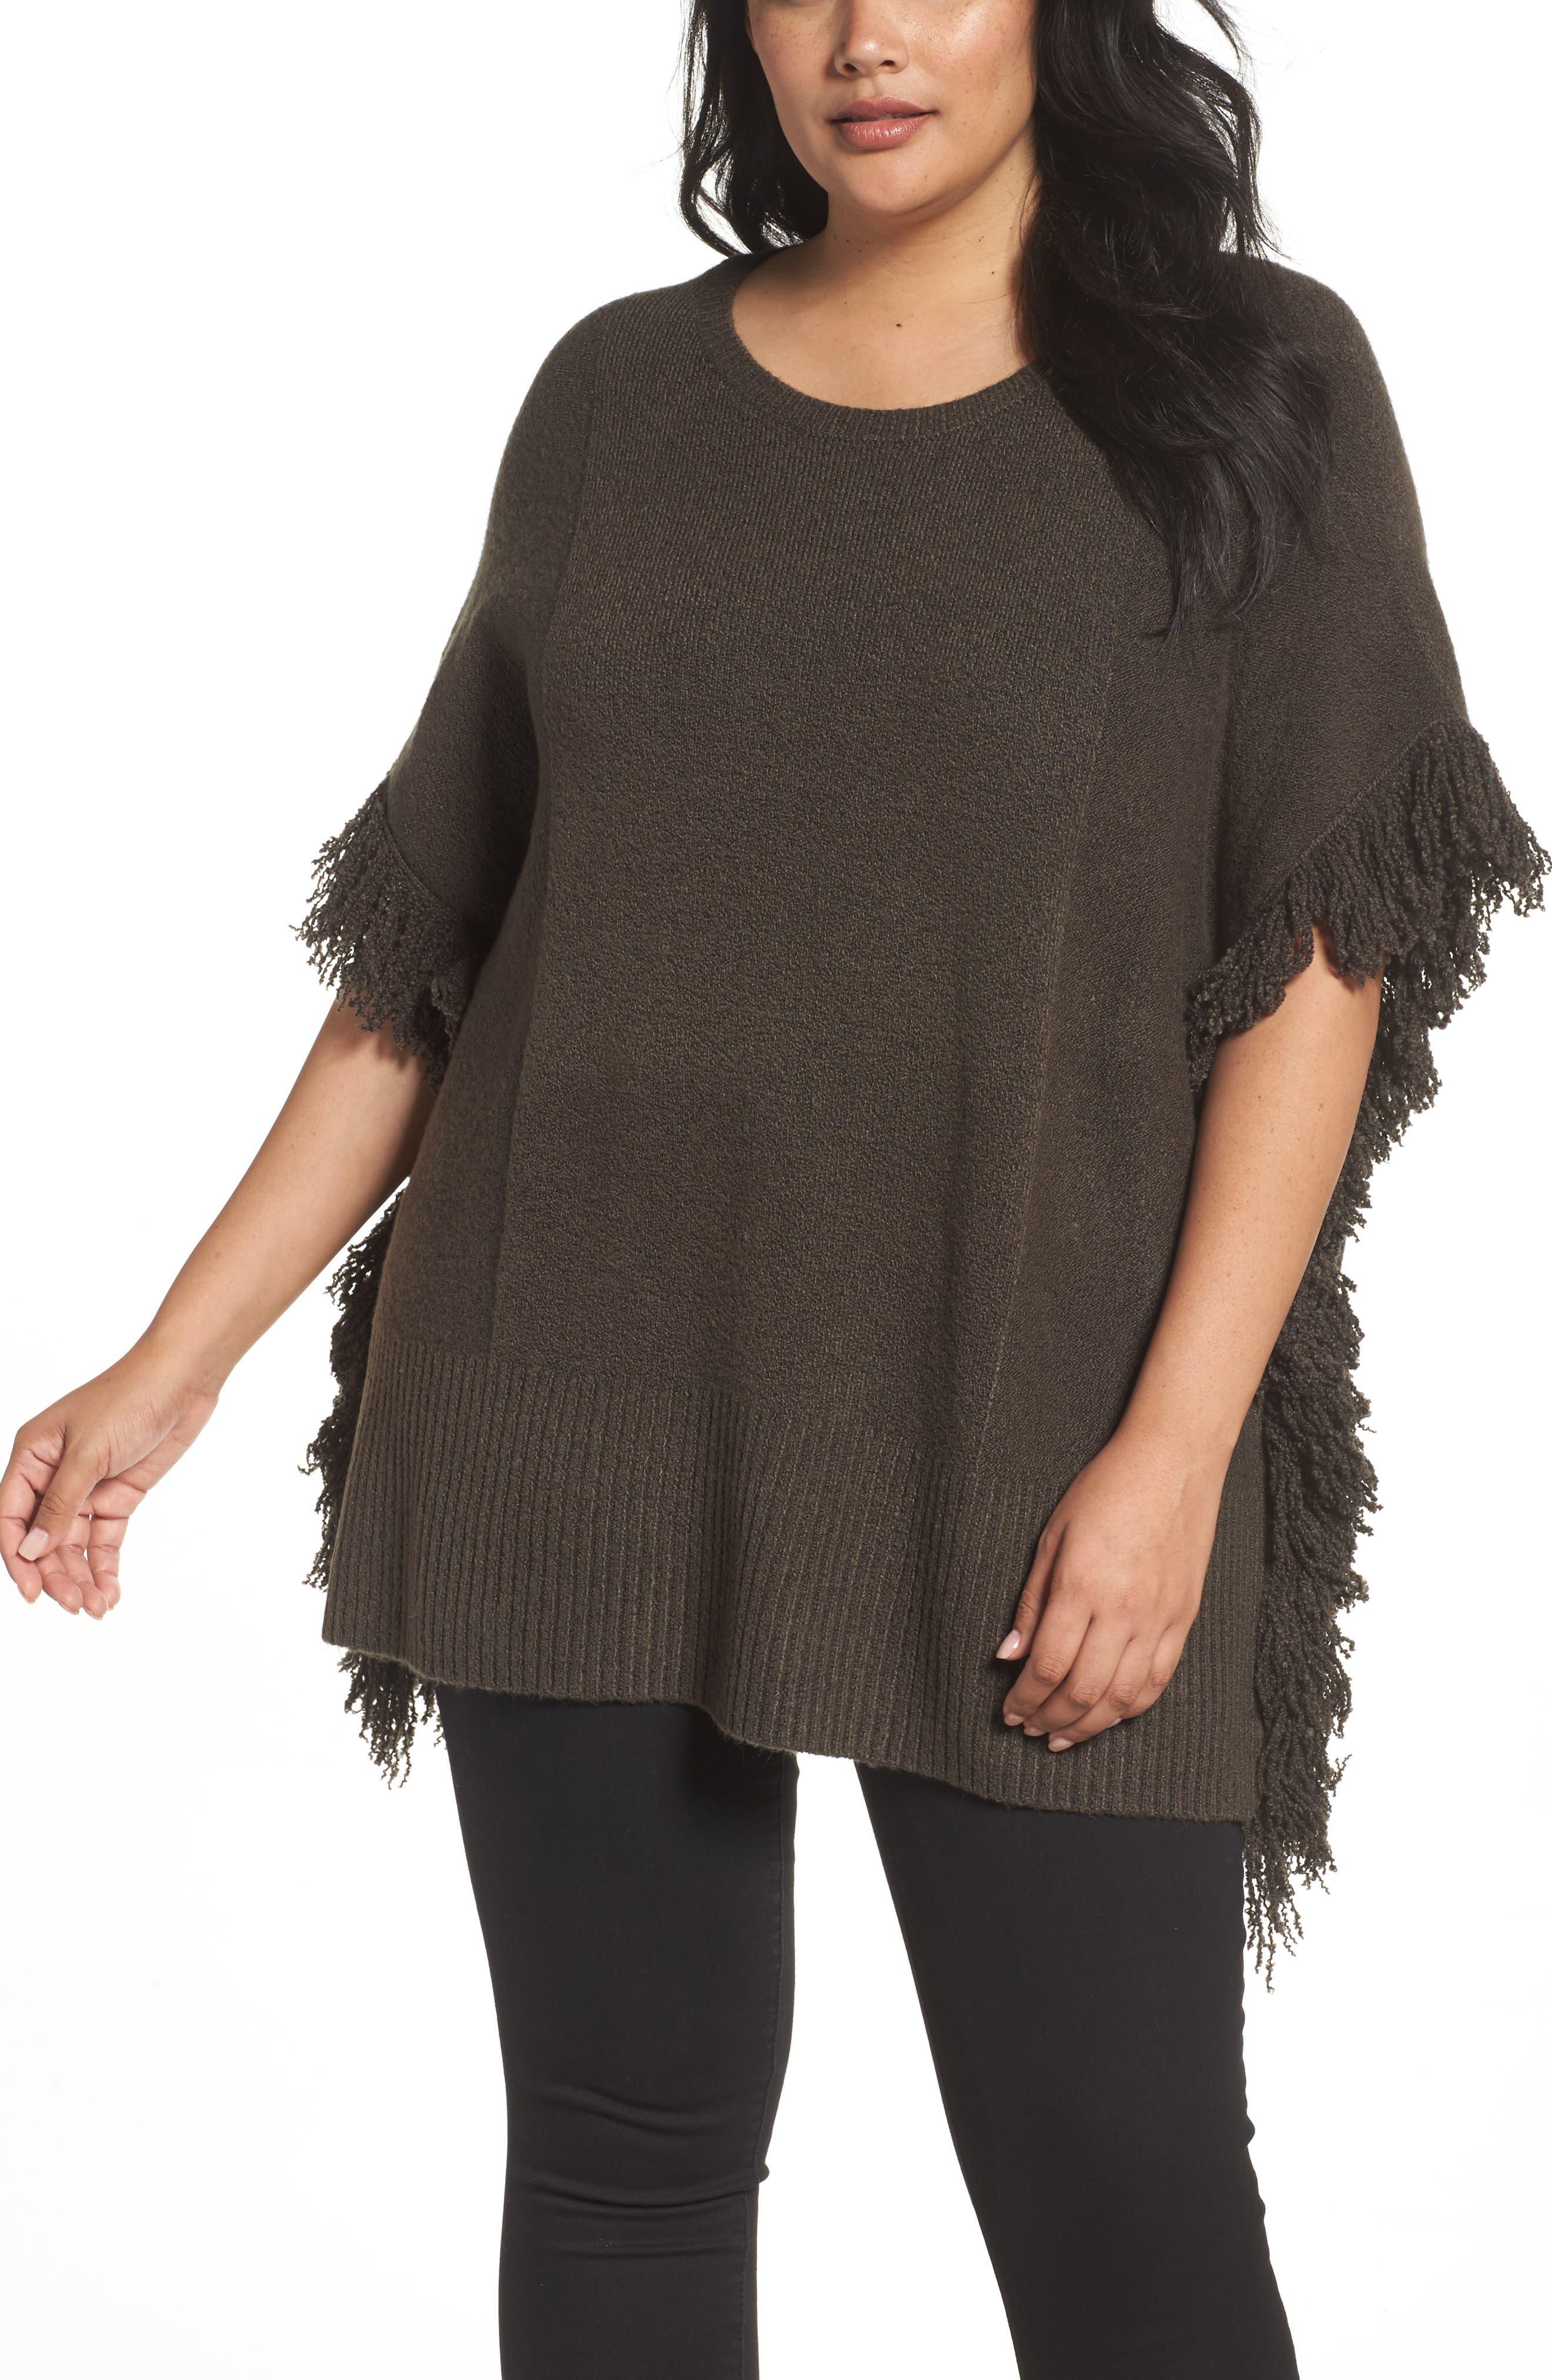 Alternate Image 1 Selected - Sejour Fringe Poncho Sweater (Plus Size)